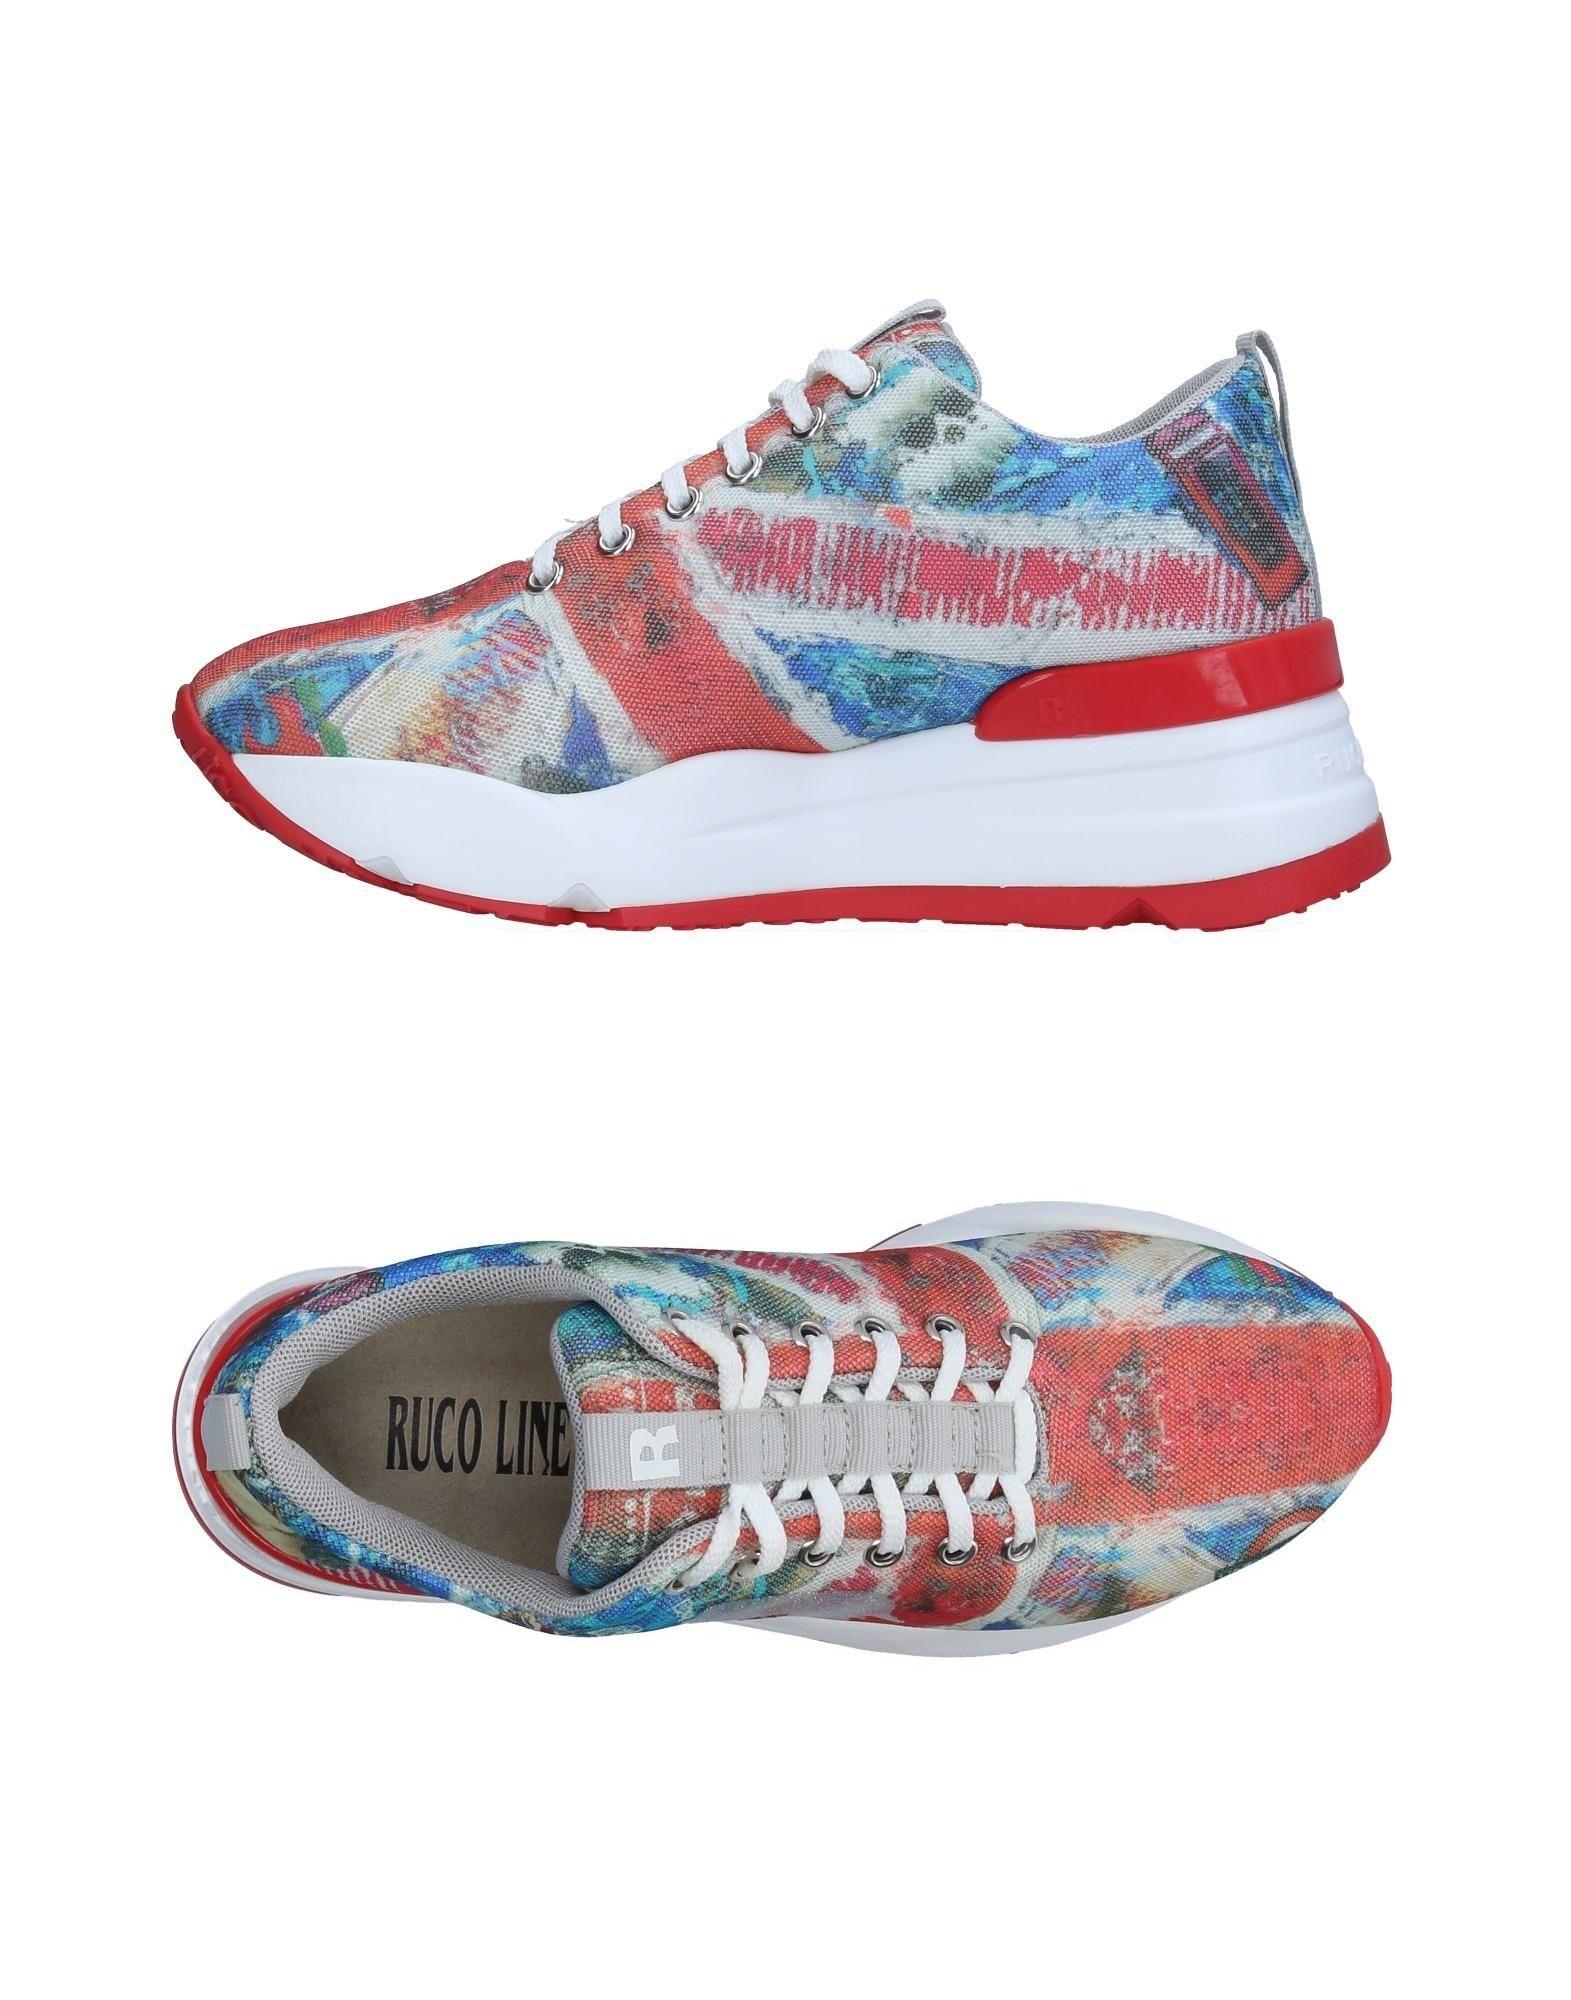 Ruco Line Sneakers Damen  11334290PU Gute Qualität beliebte Schuhe